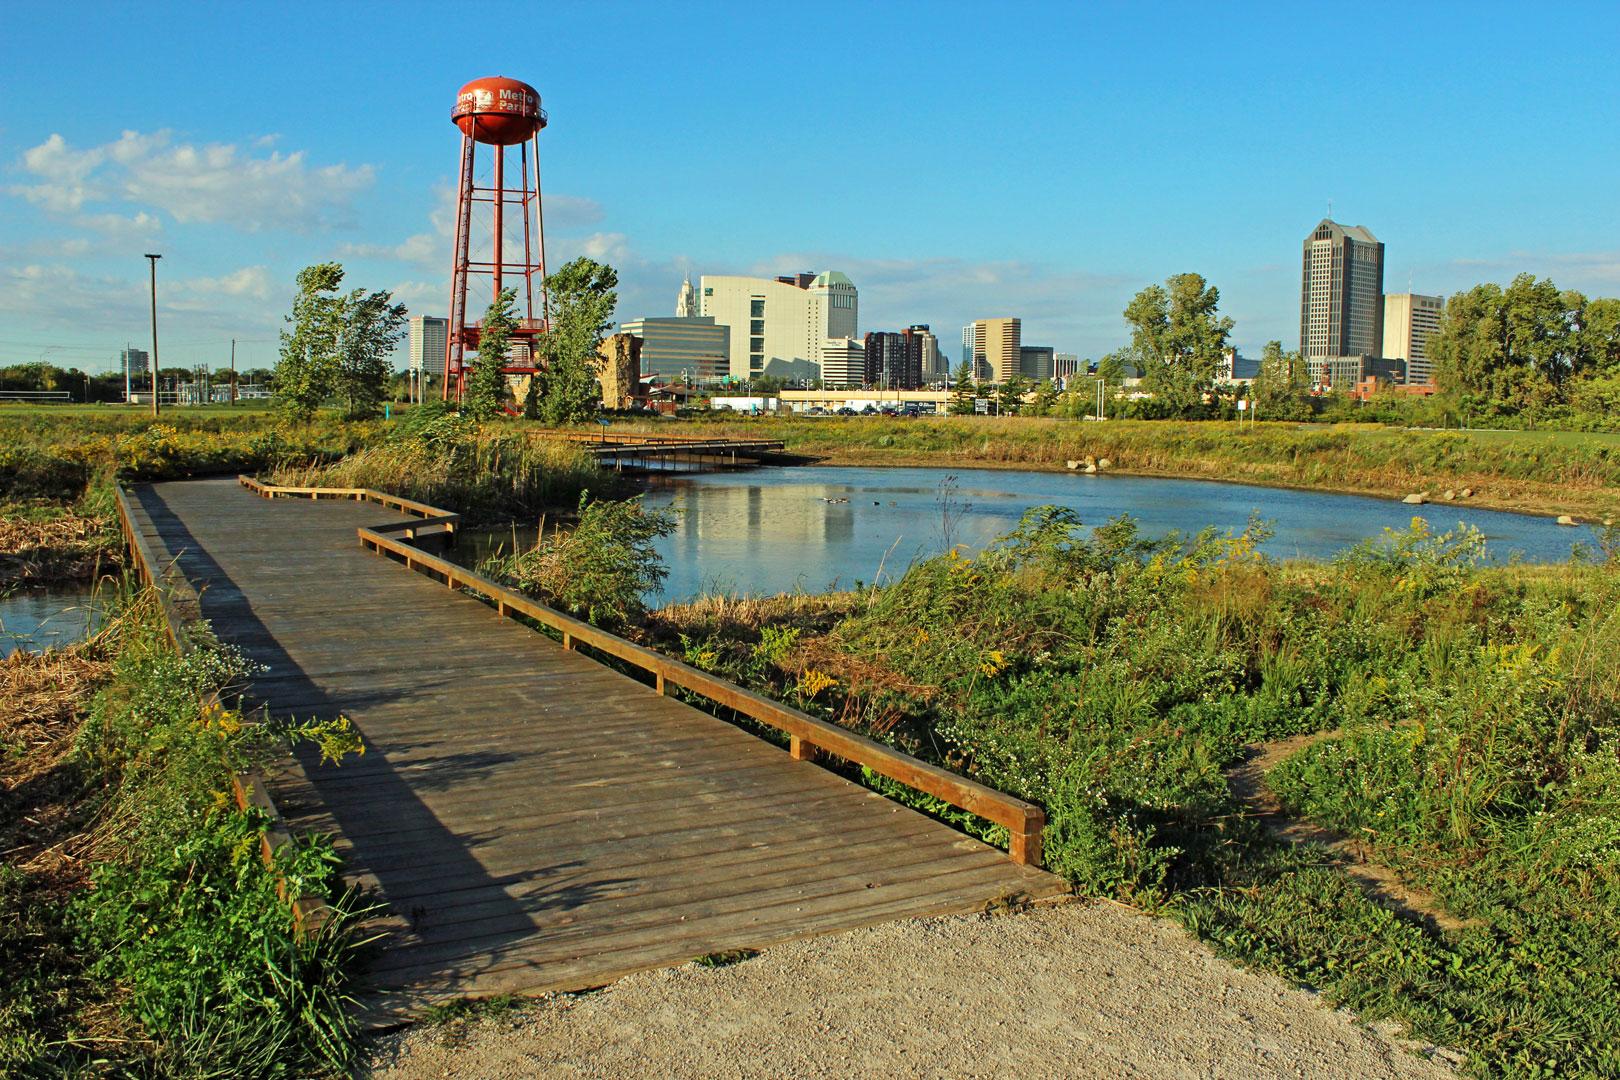 small wooden bridge and watertower at Scioto Audubon Metro Park